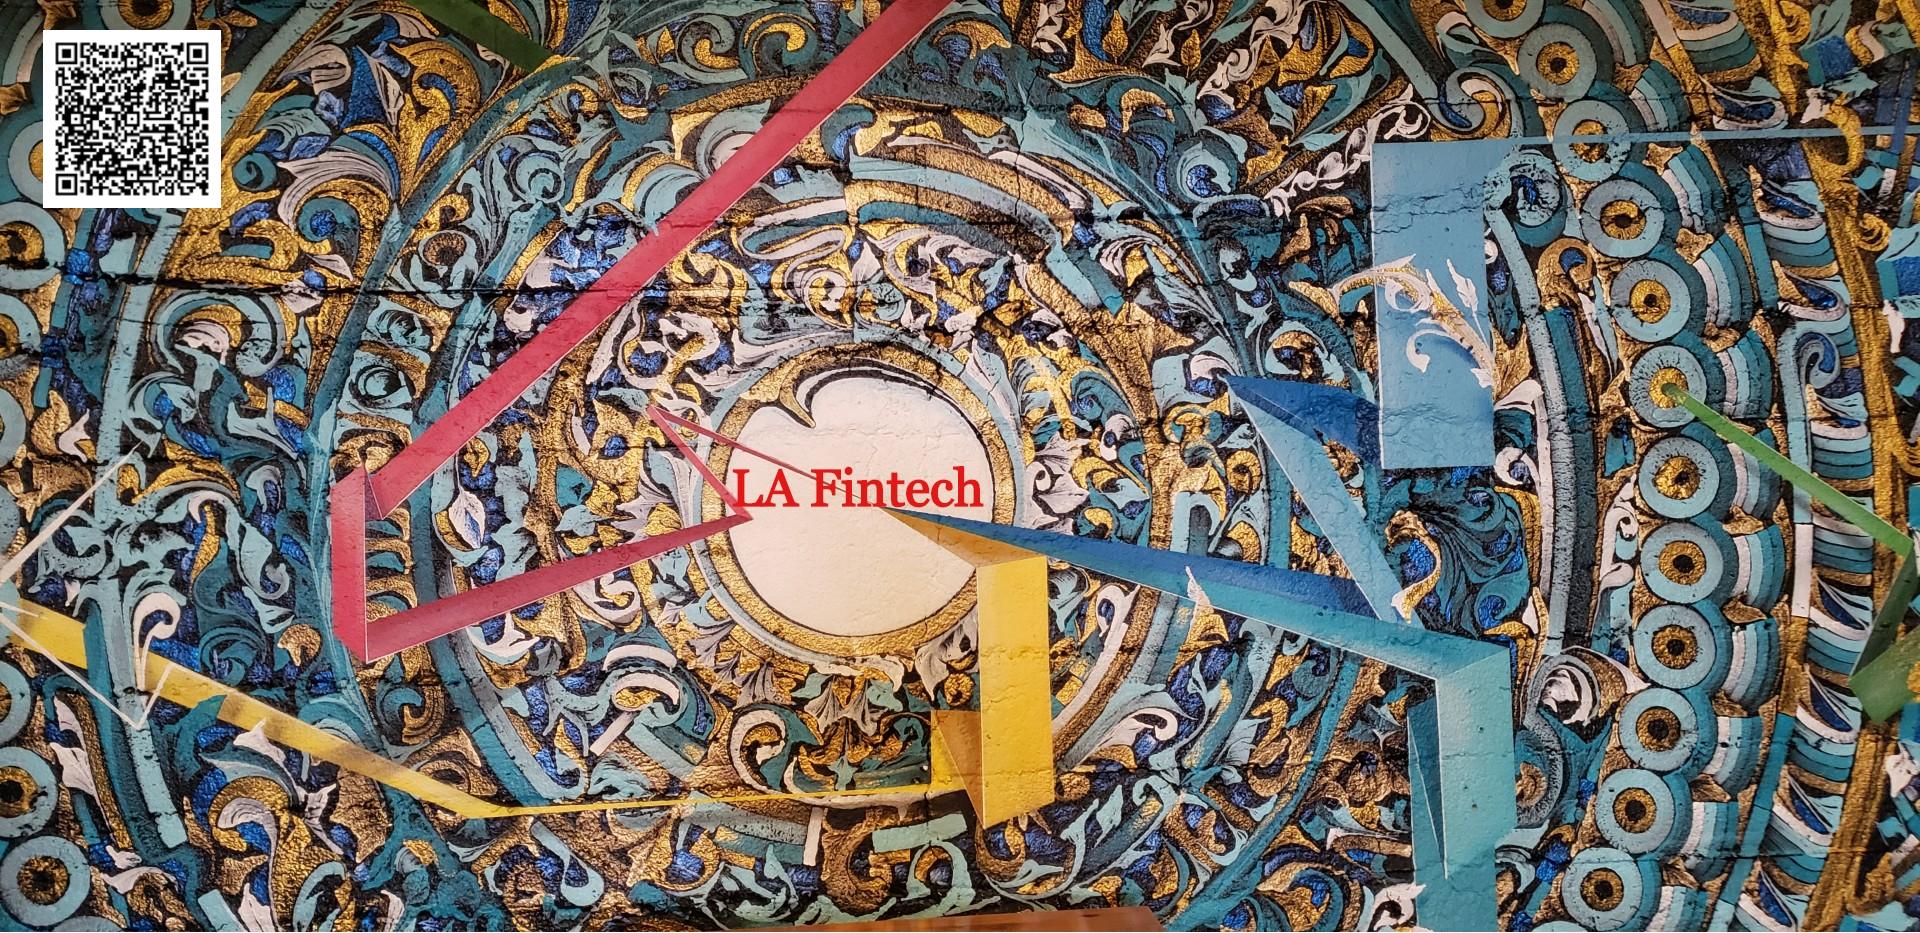 LA Fintech Mix Mingle Network Duplicate